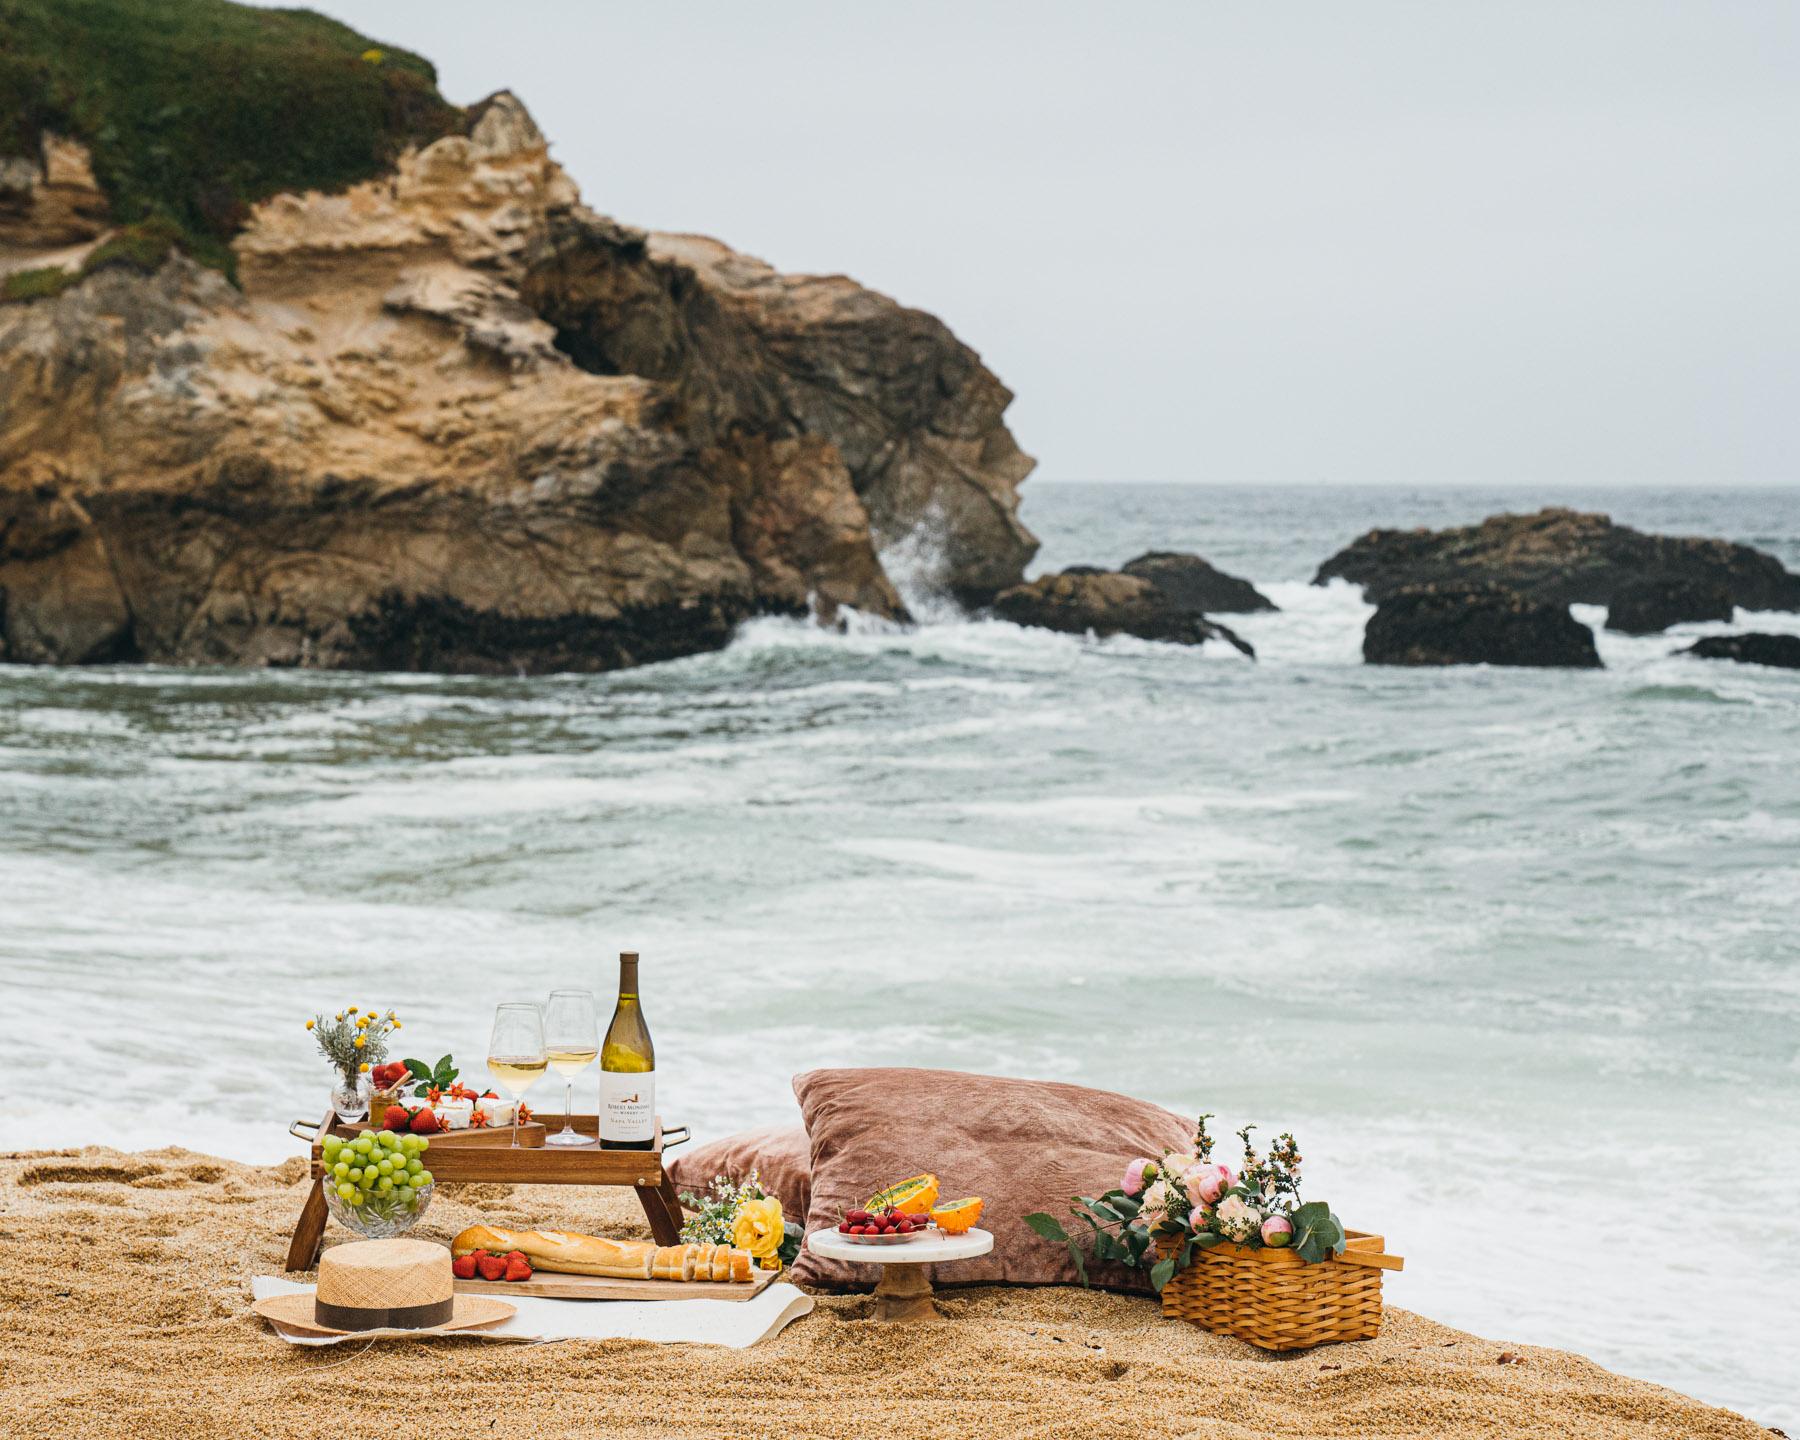 robert-mondavi-beach-picnic-5.jpg